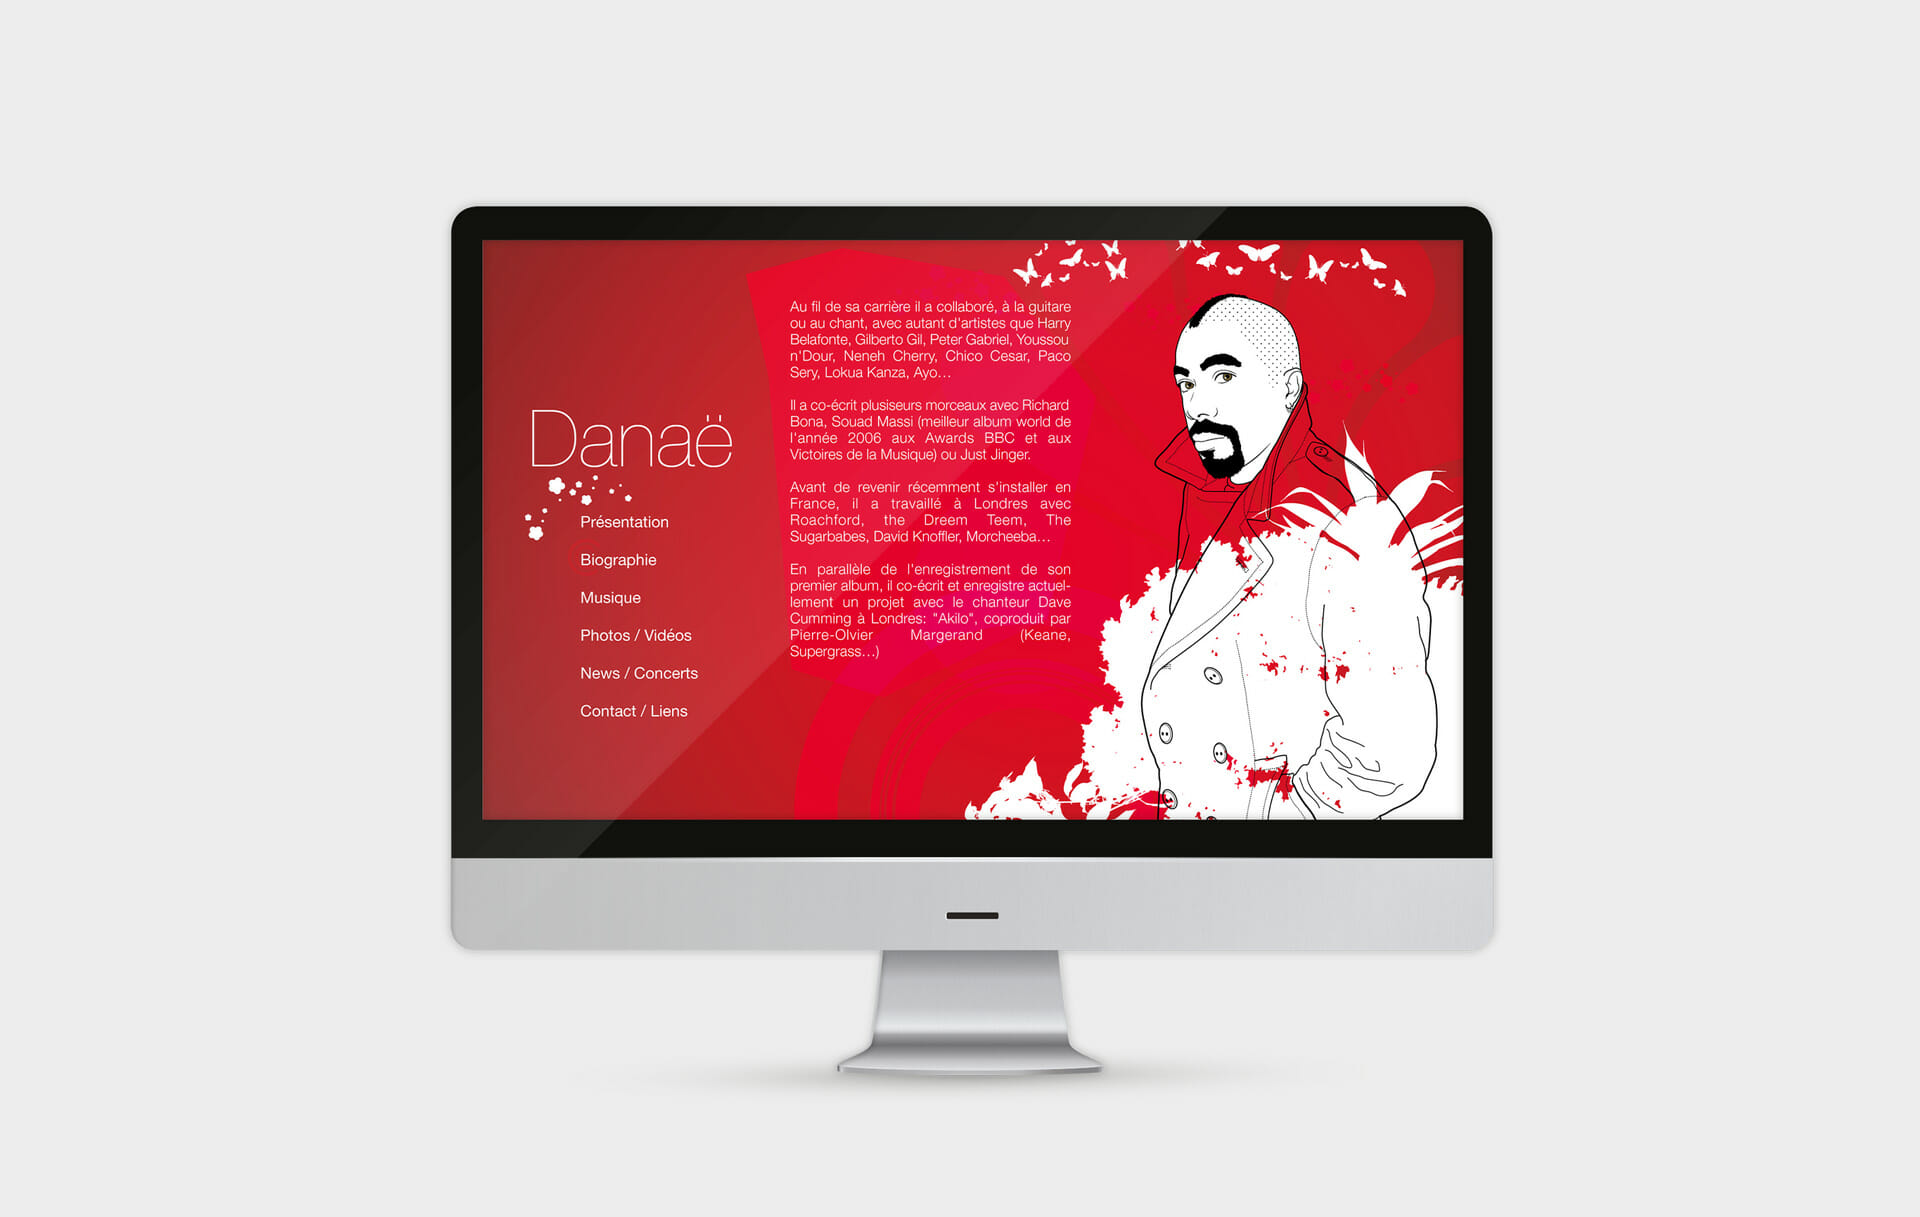 danae_Paris-Pap_site-03